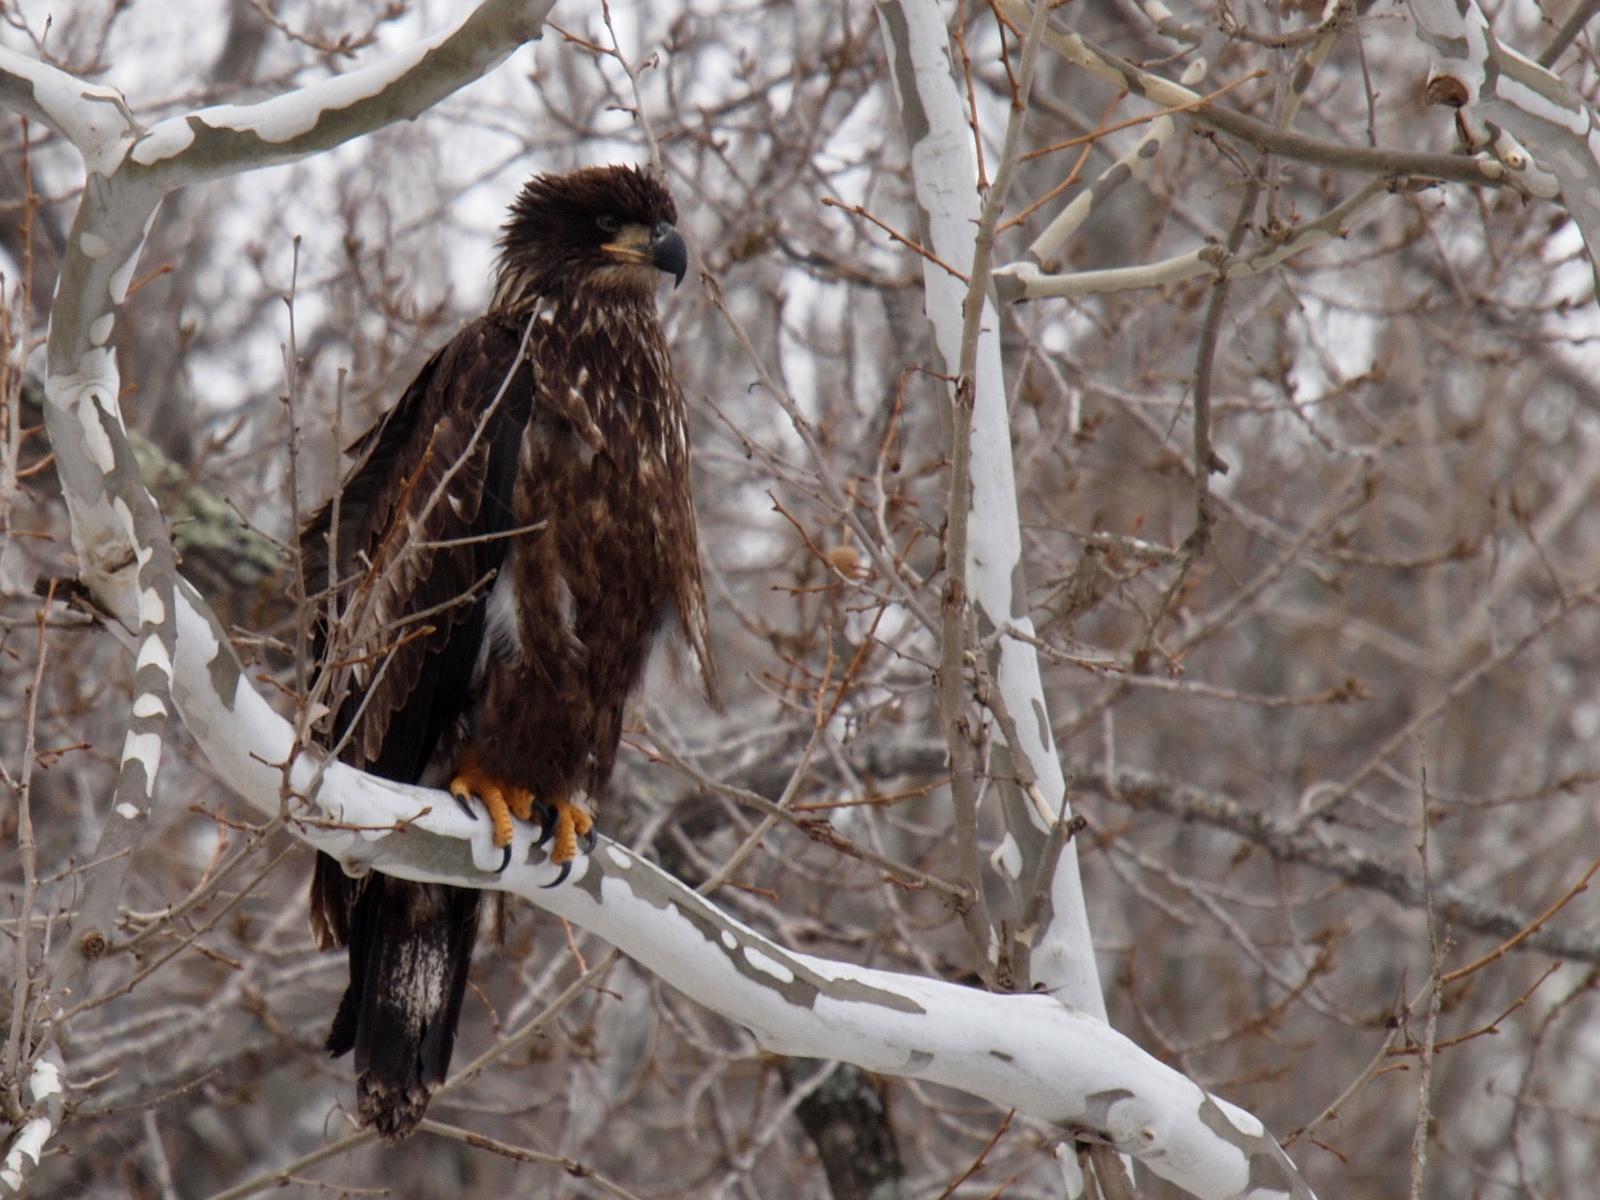 Immature Bald Eagle (Ken Thomas via Wikimedia Commons)